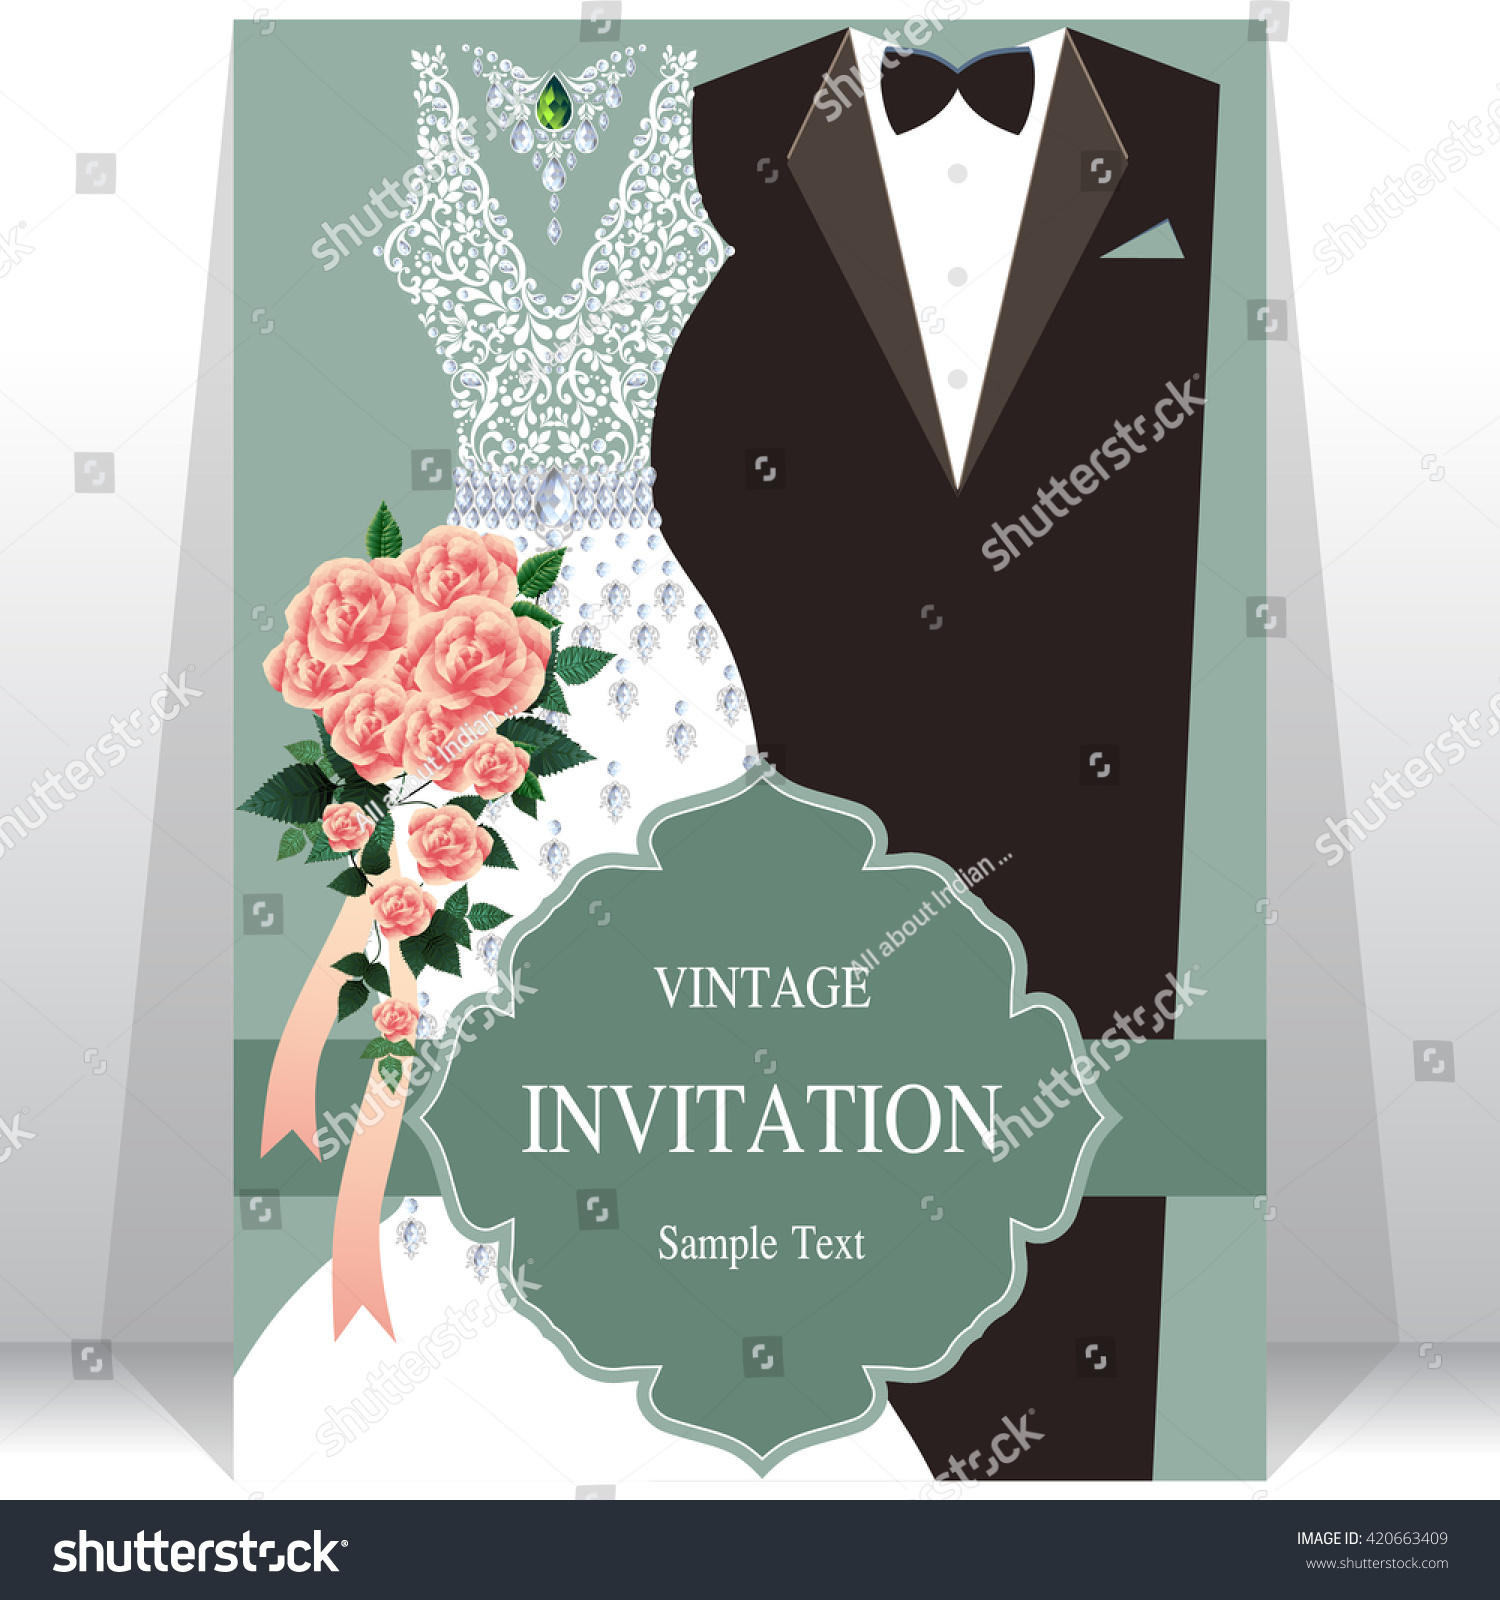 Wedding Invitation Card Bride Groom Dress Stock Vector HD (Royalty ...